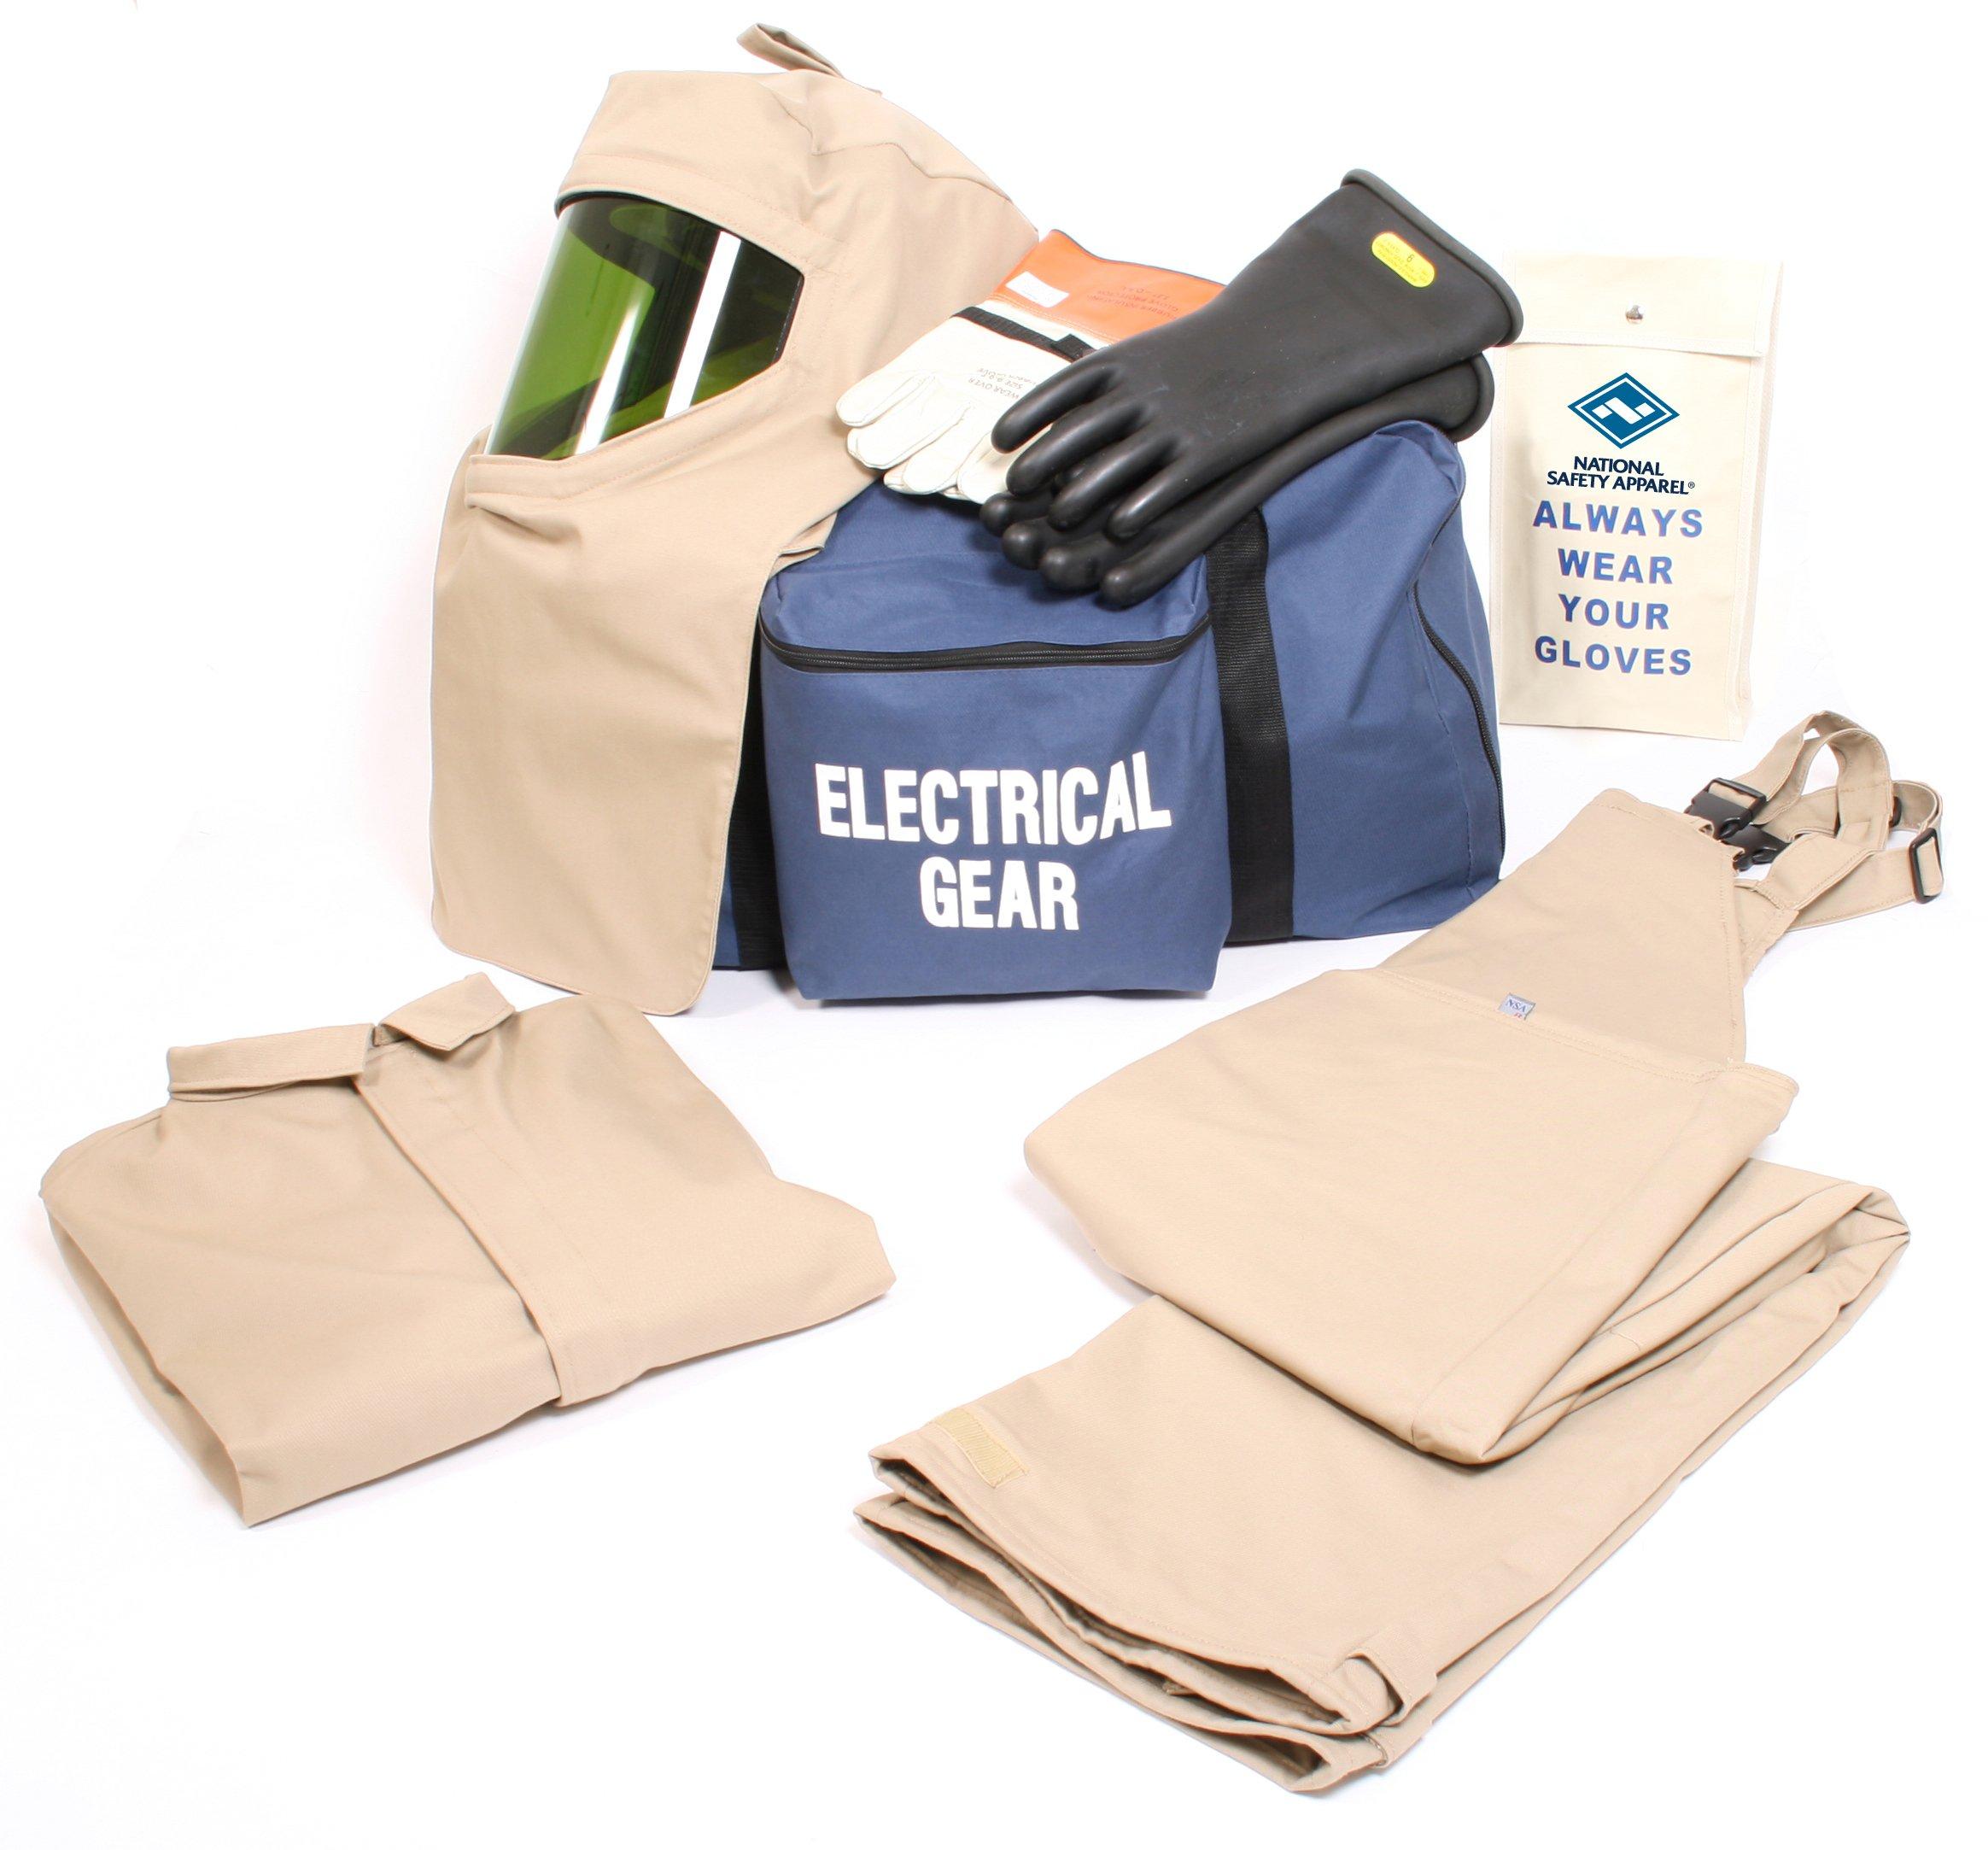 National Safety Apparel KIT4SC40ECXL10 ArcGuard Economy Arc Flash Kit with Short Coat and Bib Overall, 40 Calorie, X-Large/Glove Size 10, Khaki